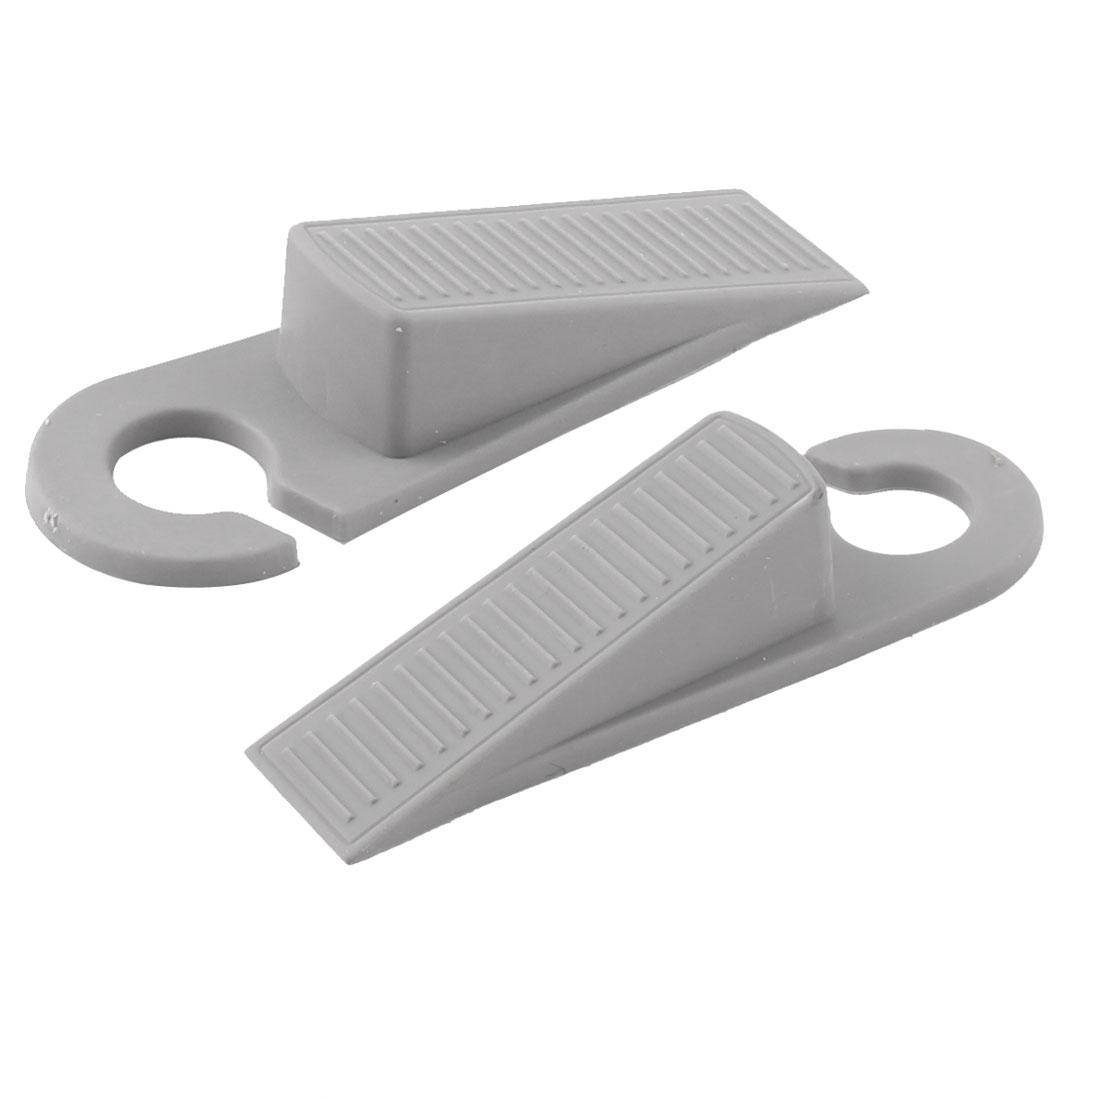 Home Office Floor Rubber Anti-slip Door Stopper Guard Protector Gray Pair